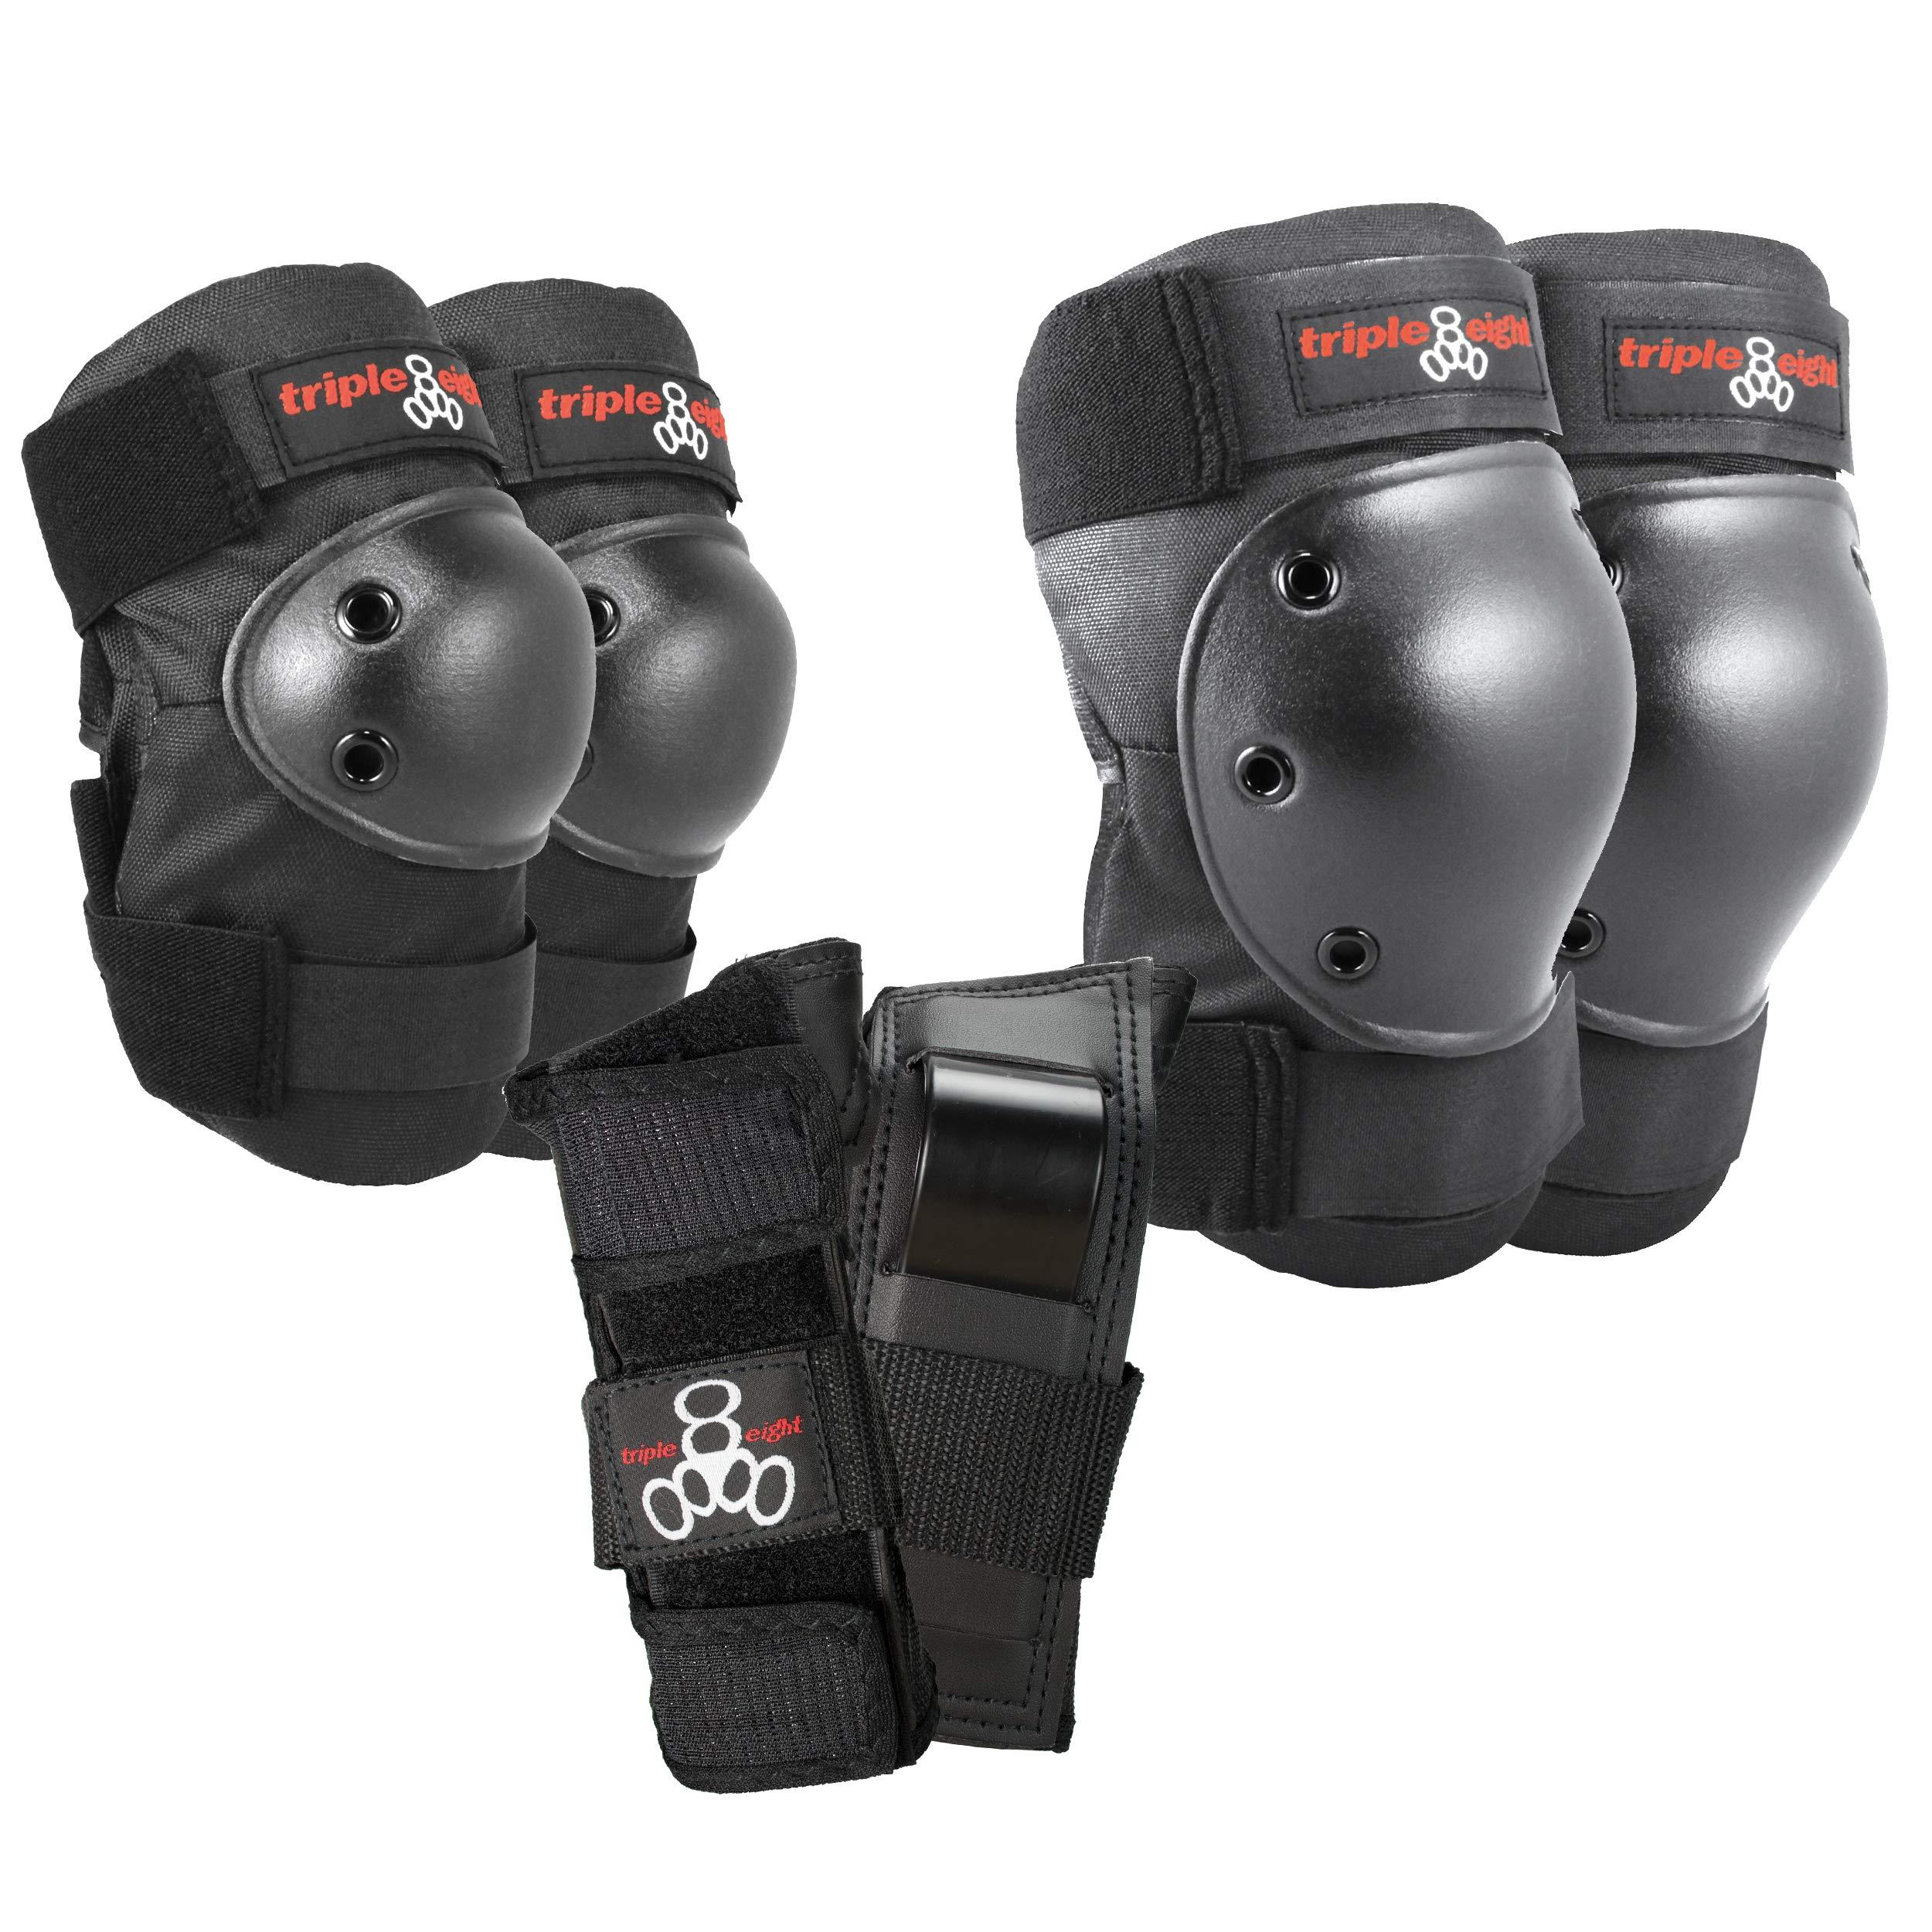 Triple Eight Saver Series Pad Set with Kneesavers, Elbowsavers and Wristsavers, Medium by Triple Eight